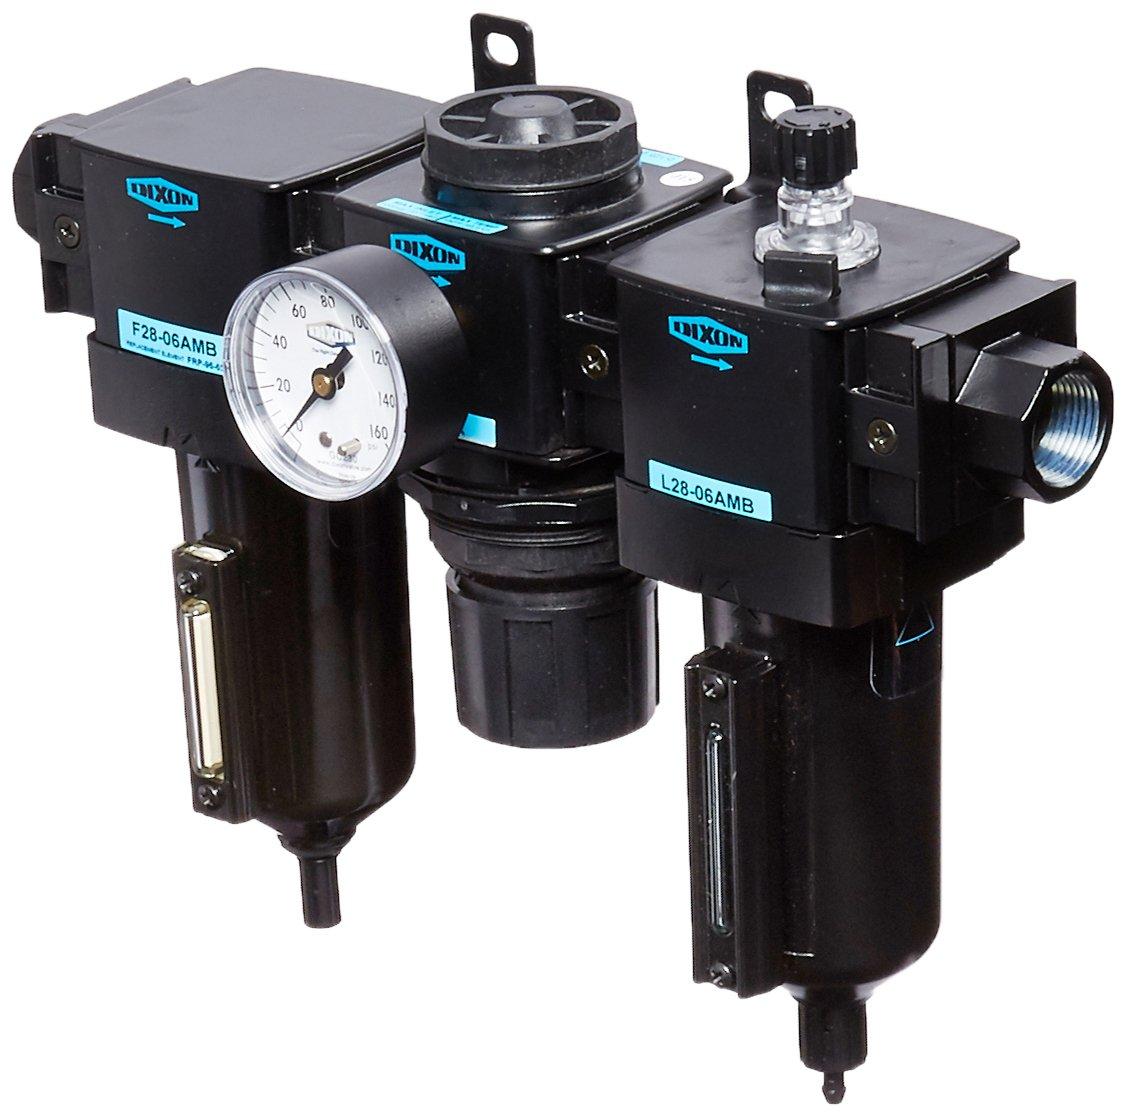 175 SCFM Flow 3//4 Size Dixon C28-06AMB Automatic Drain Wilkerson Standard Combination Unit with Metal Bowl and Sight Glass 250 psig Pressure